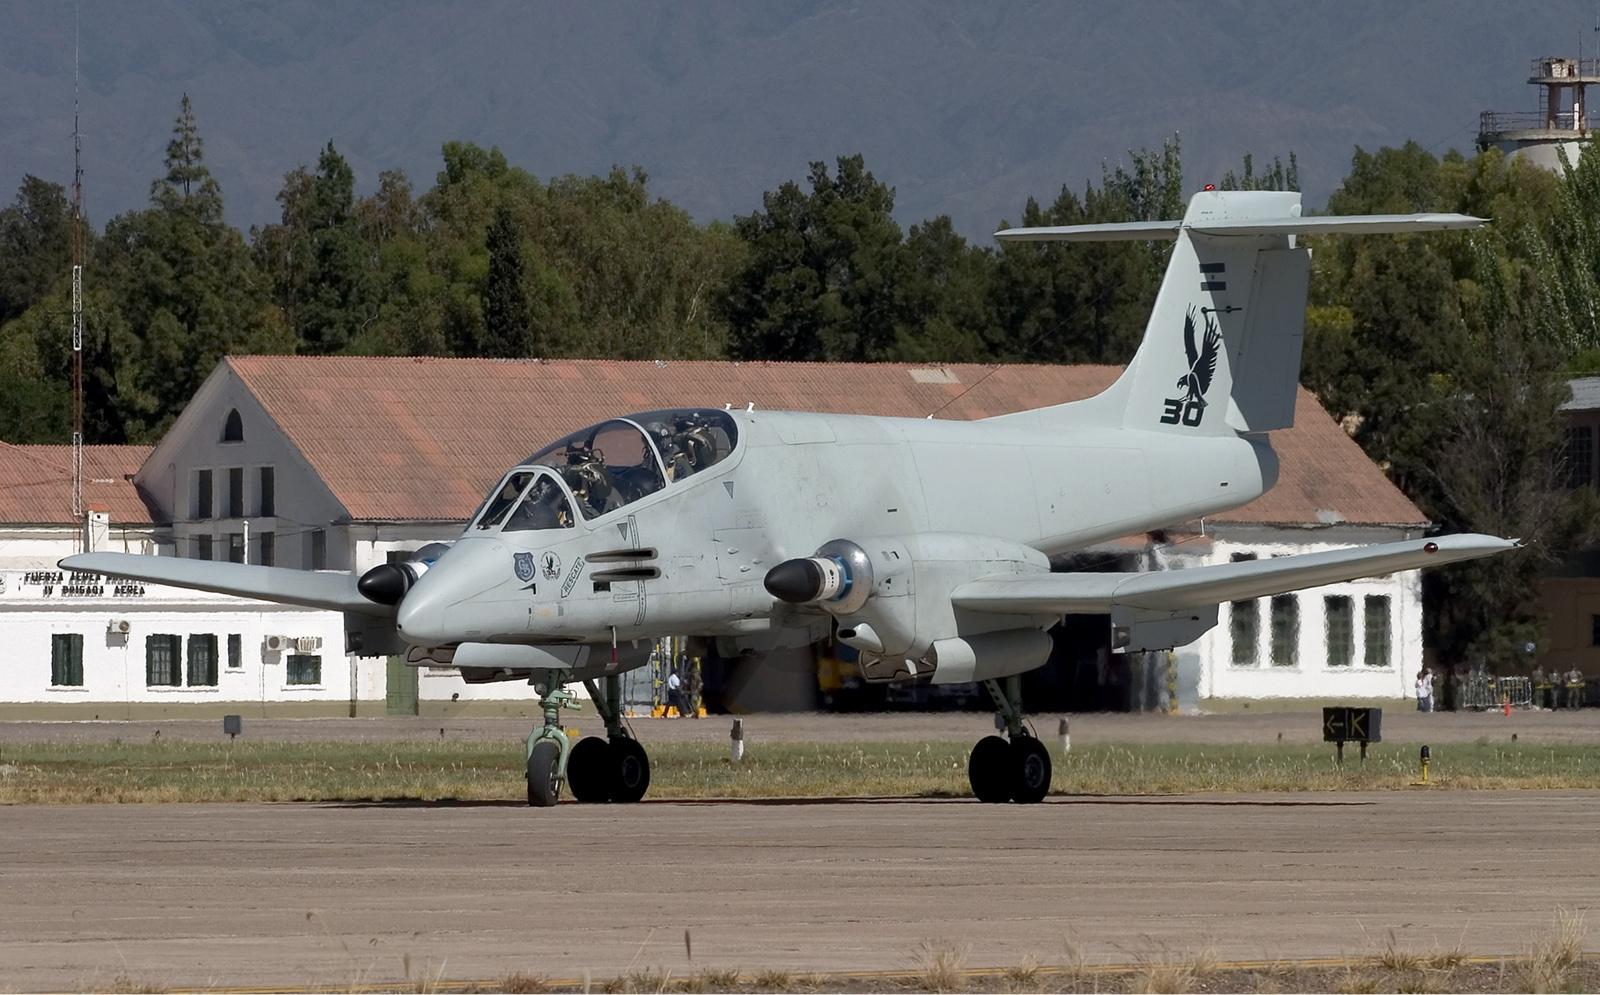 Archivo:Argentina Air Force FMA IA 58A Pucara Lofting 1.jpg